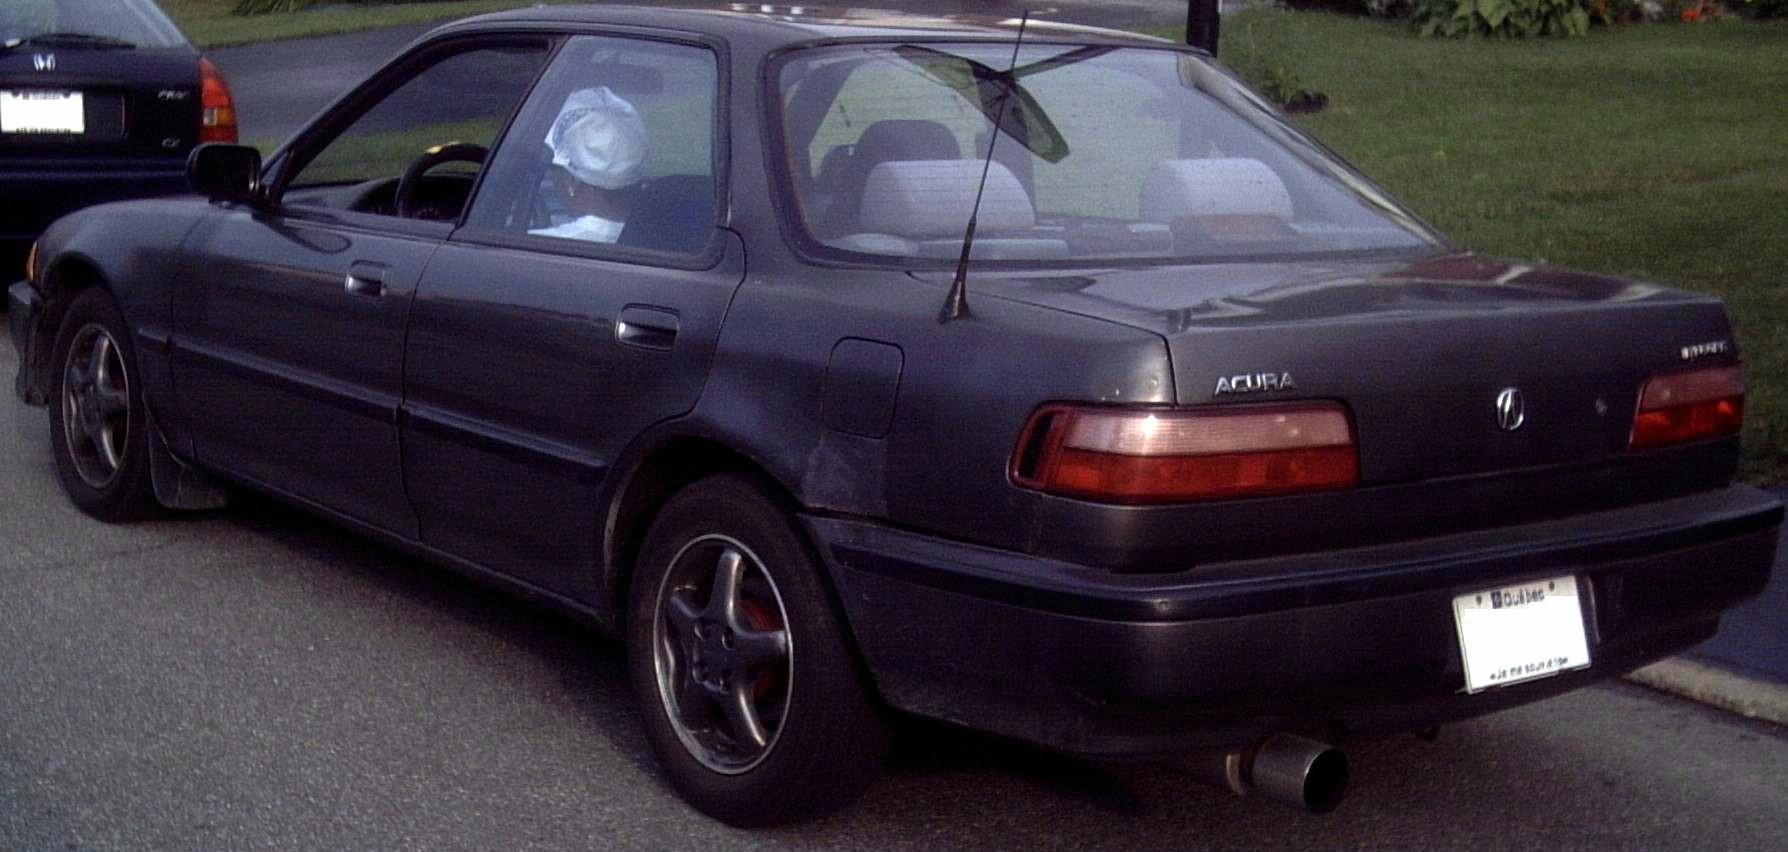 File Acura Integra Sedan 1991 93 Jpg Wikimedia Commons